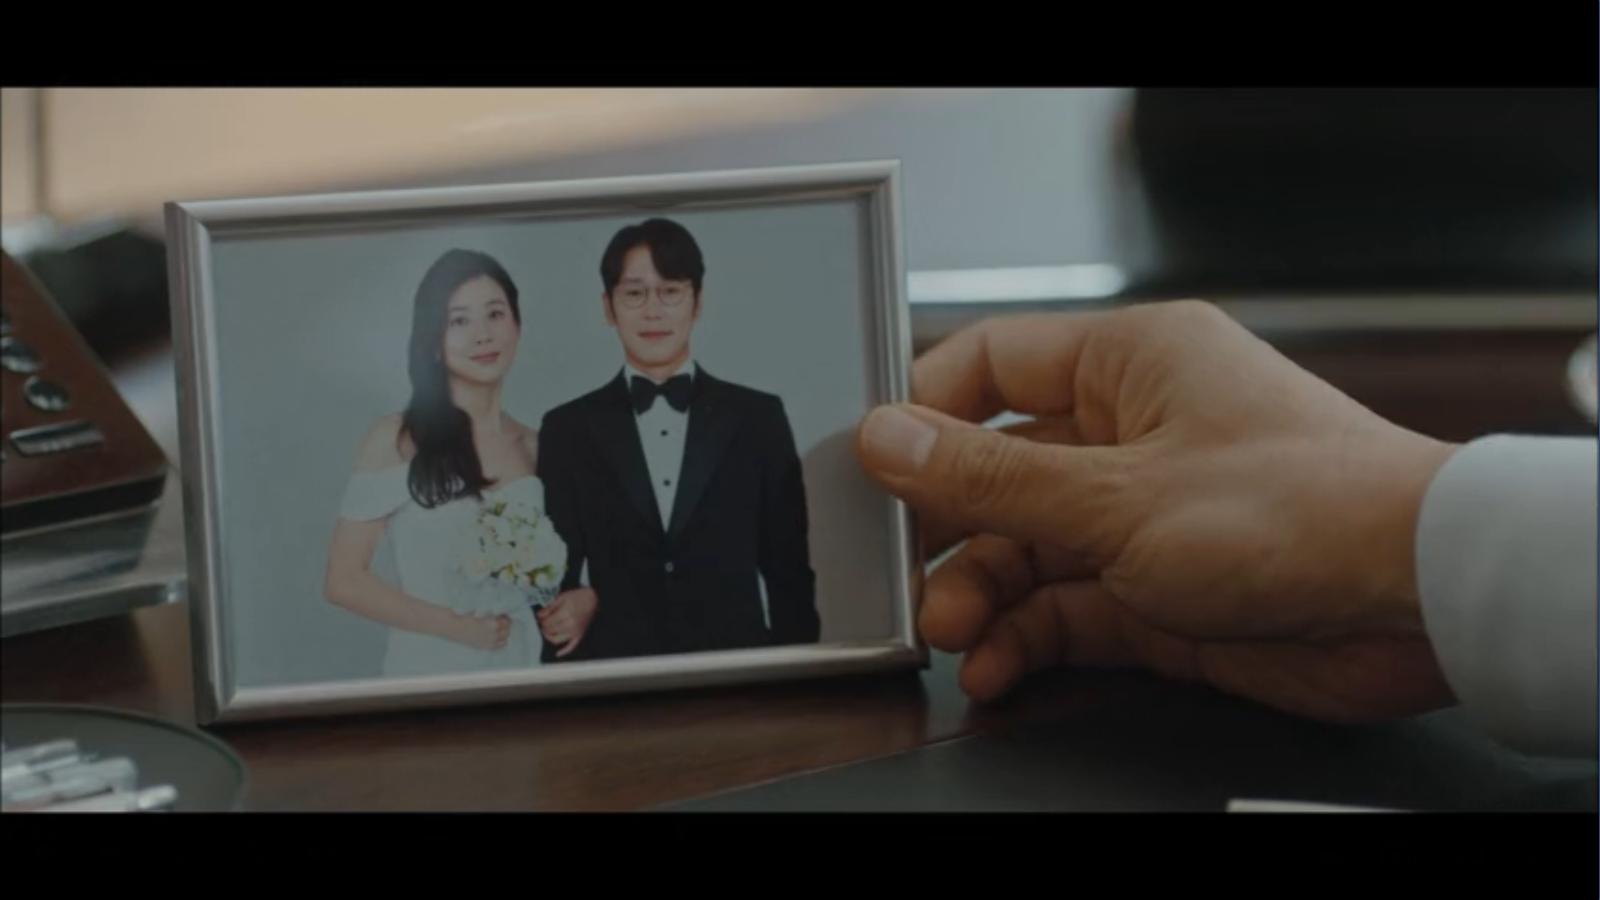 When My Love Blooms Episode 2 Yoon Ji-soo and Lee Se-hoon wedding photo